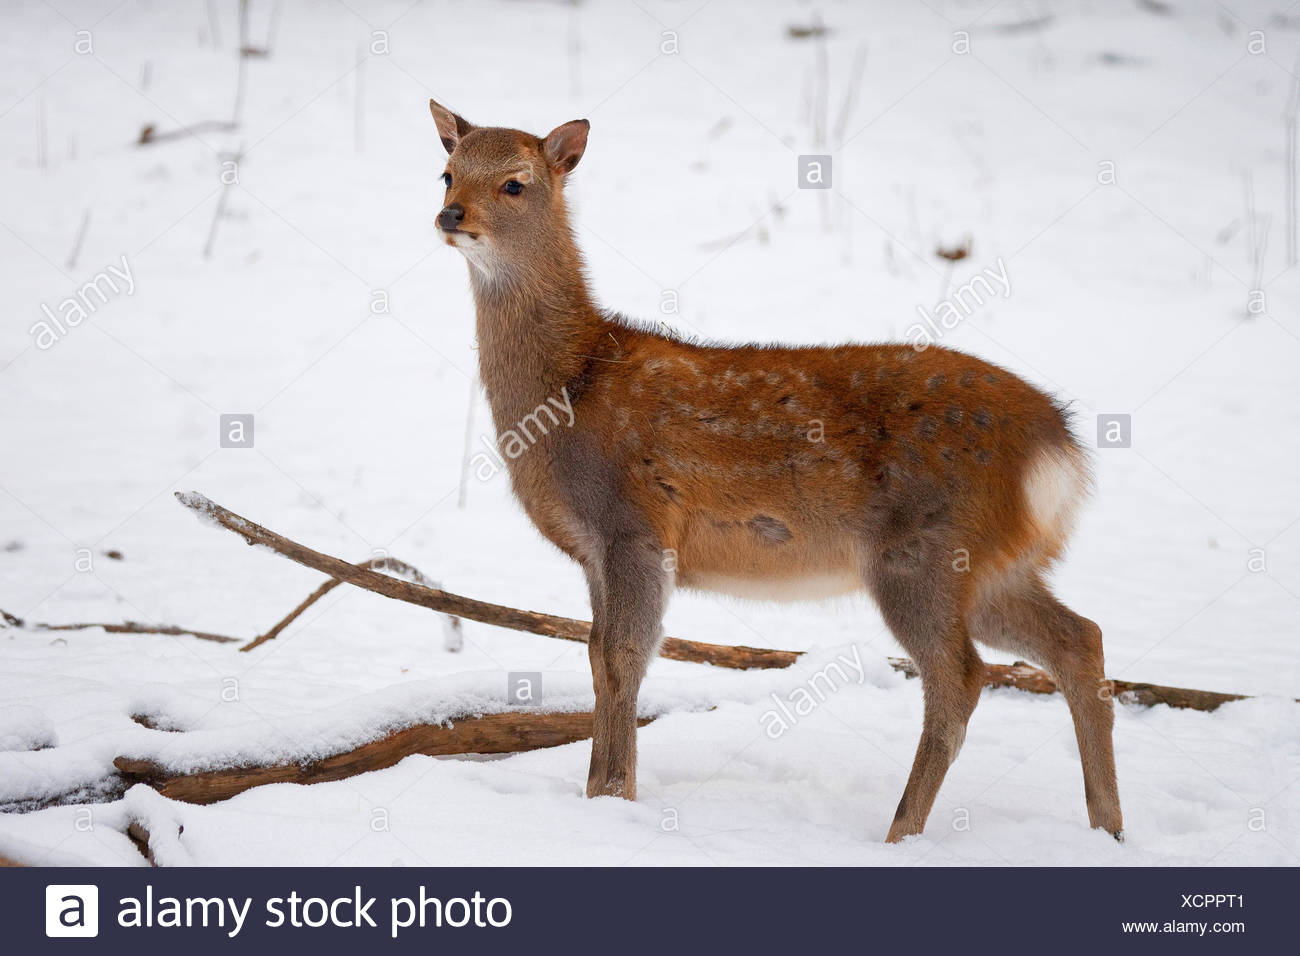 Sika cervo (Cervus nippon), capretti nella neve, Germania Immagini Stock